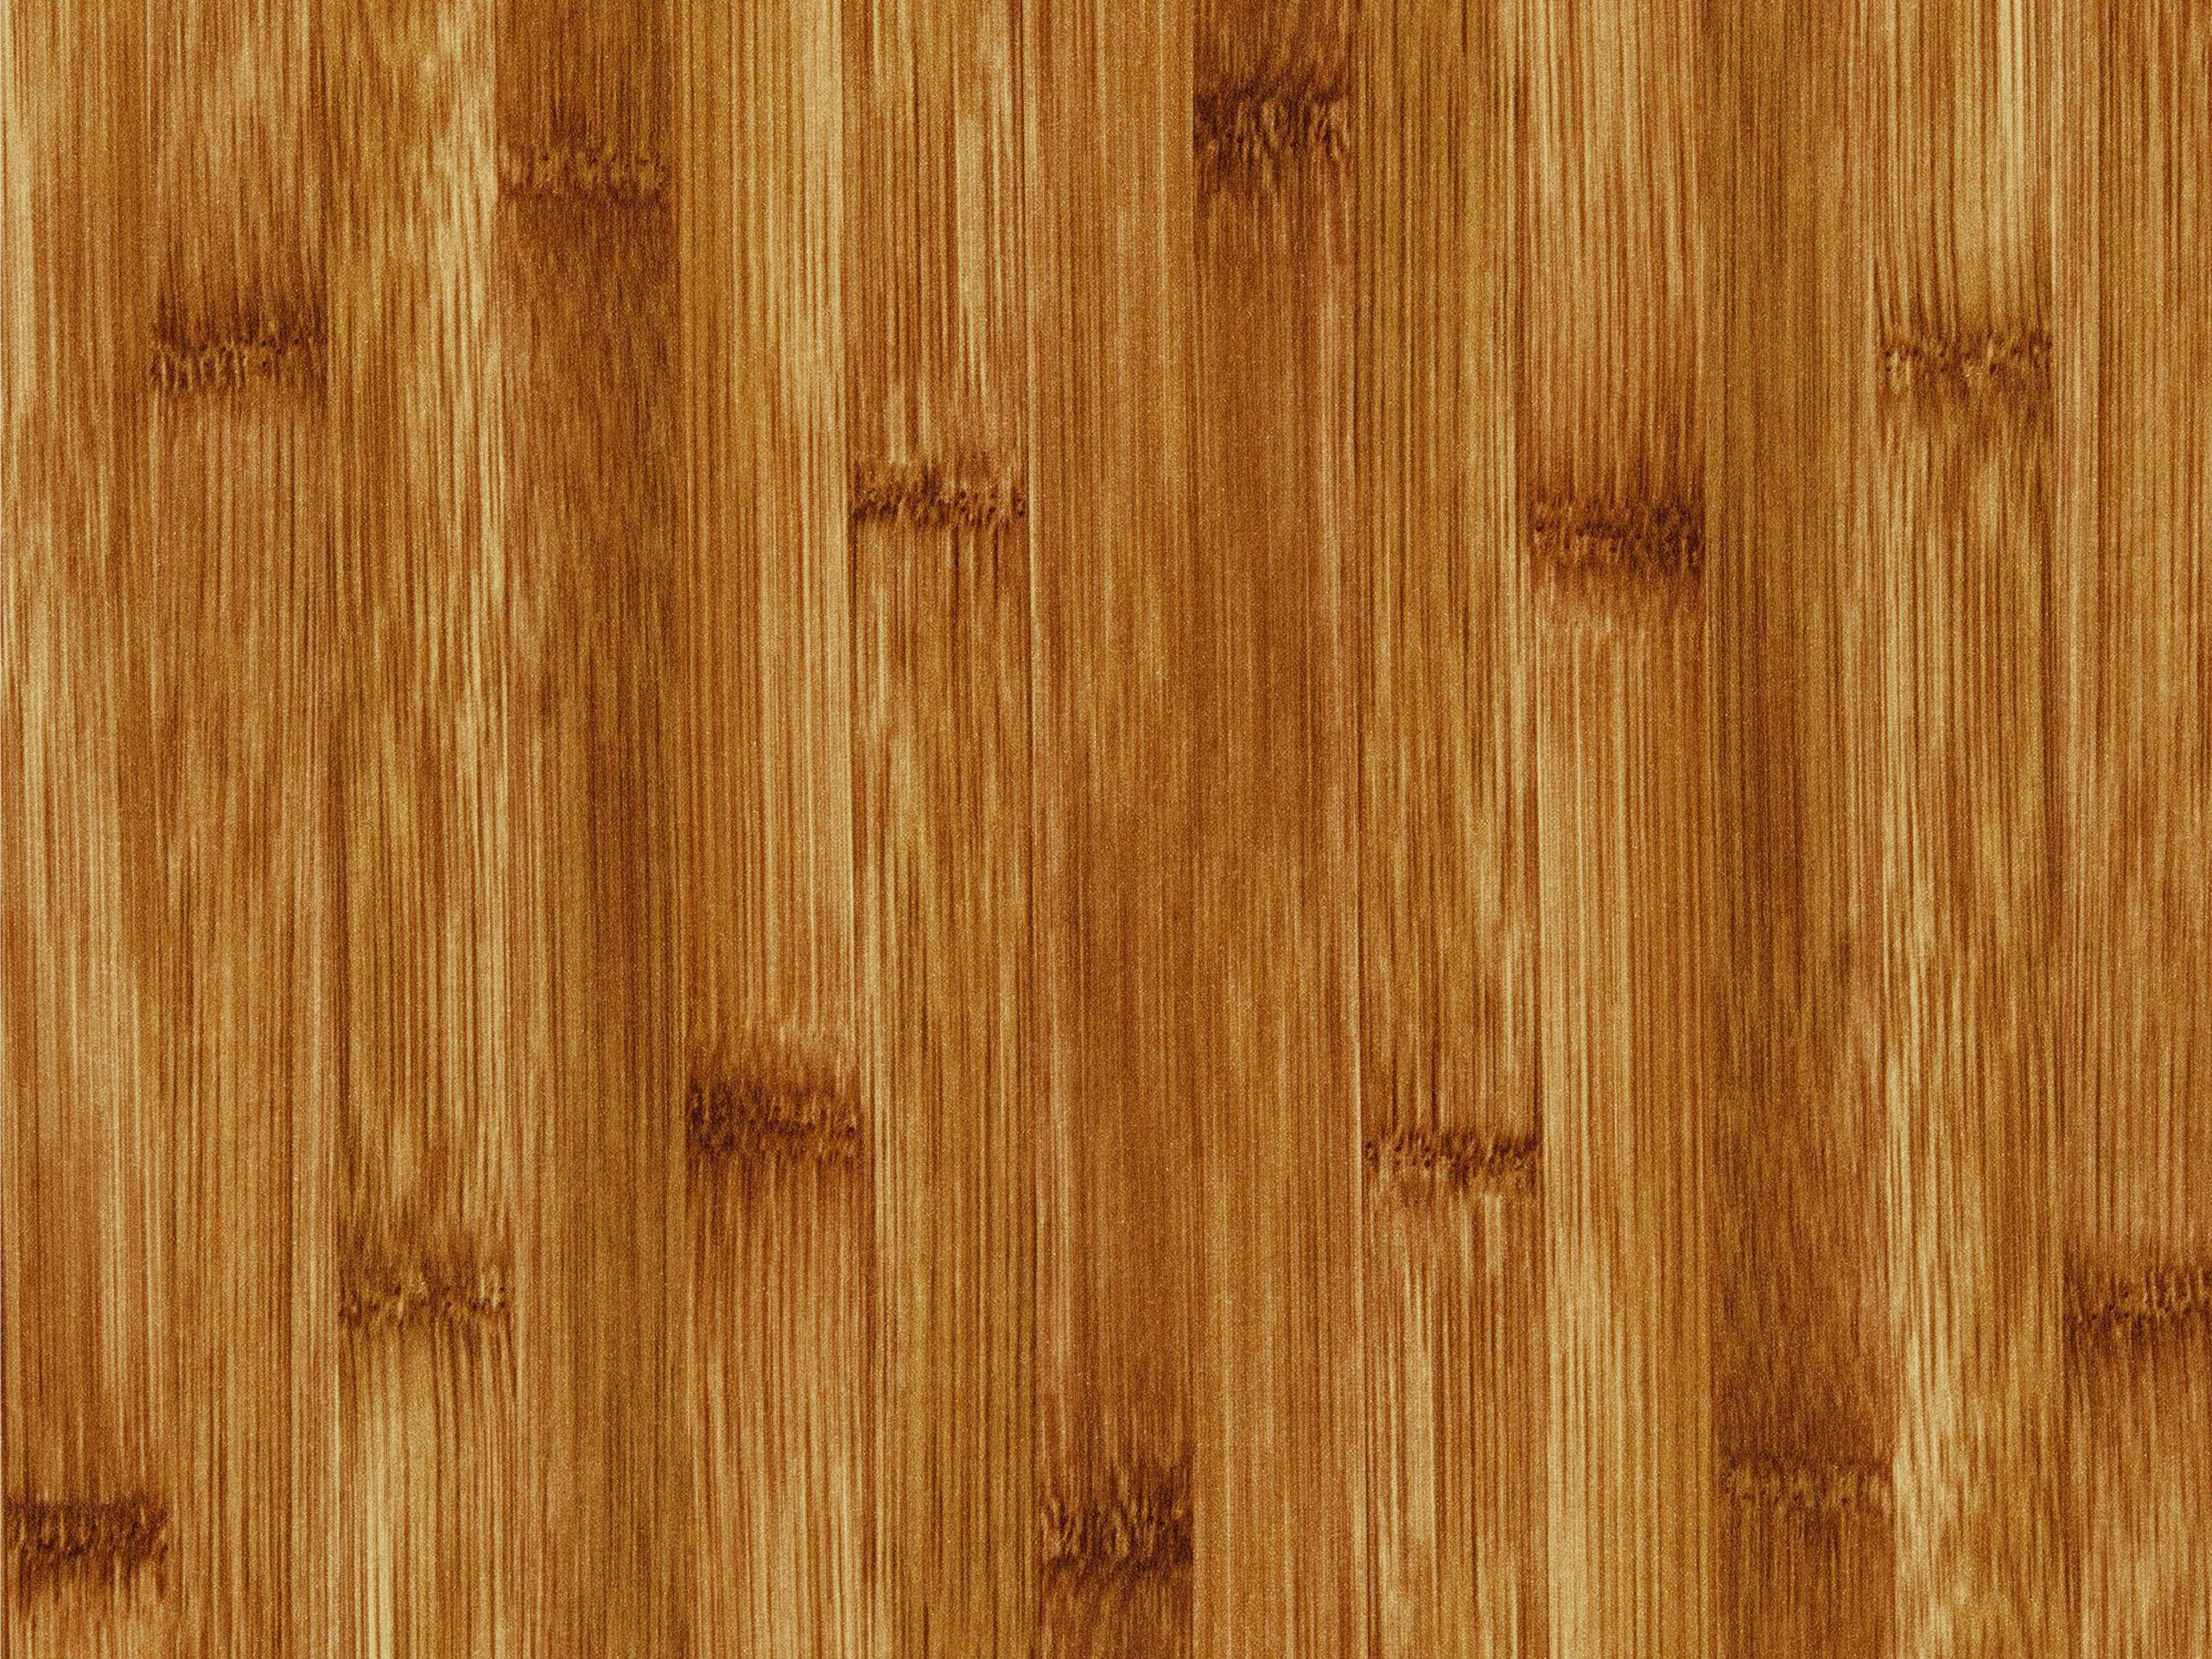 Wood Desktop